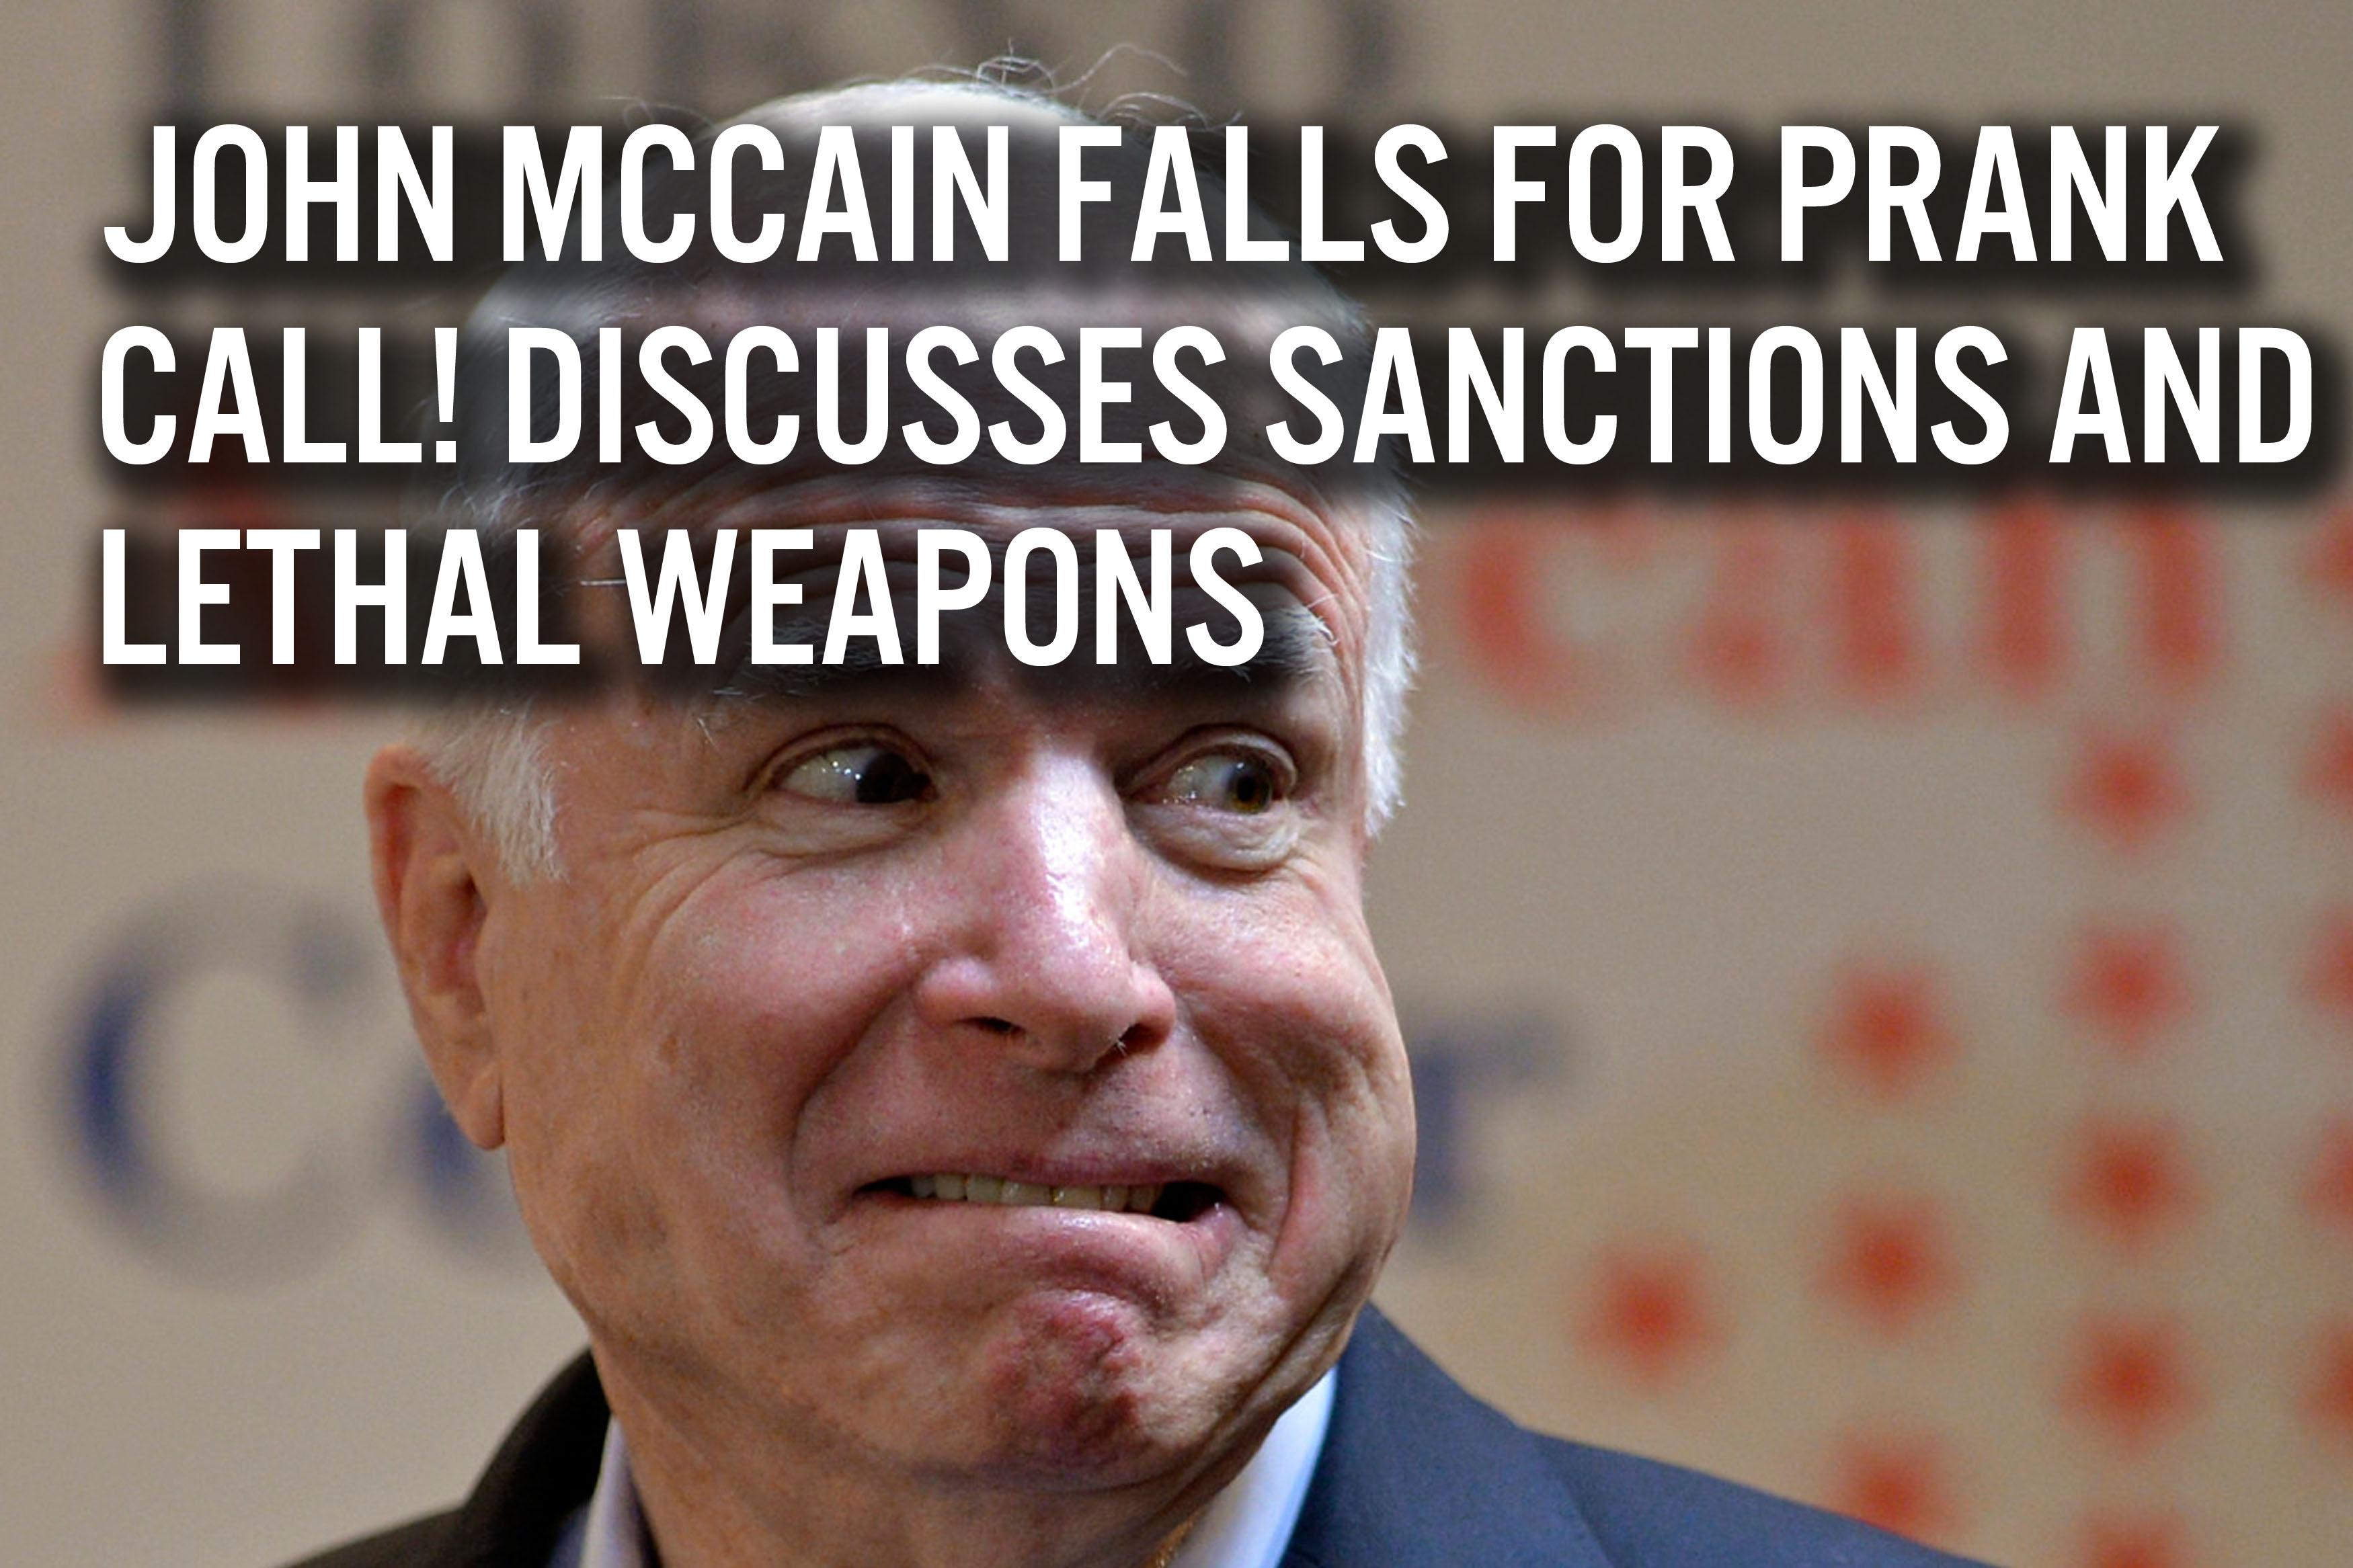 McCain Prank